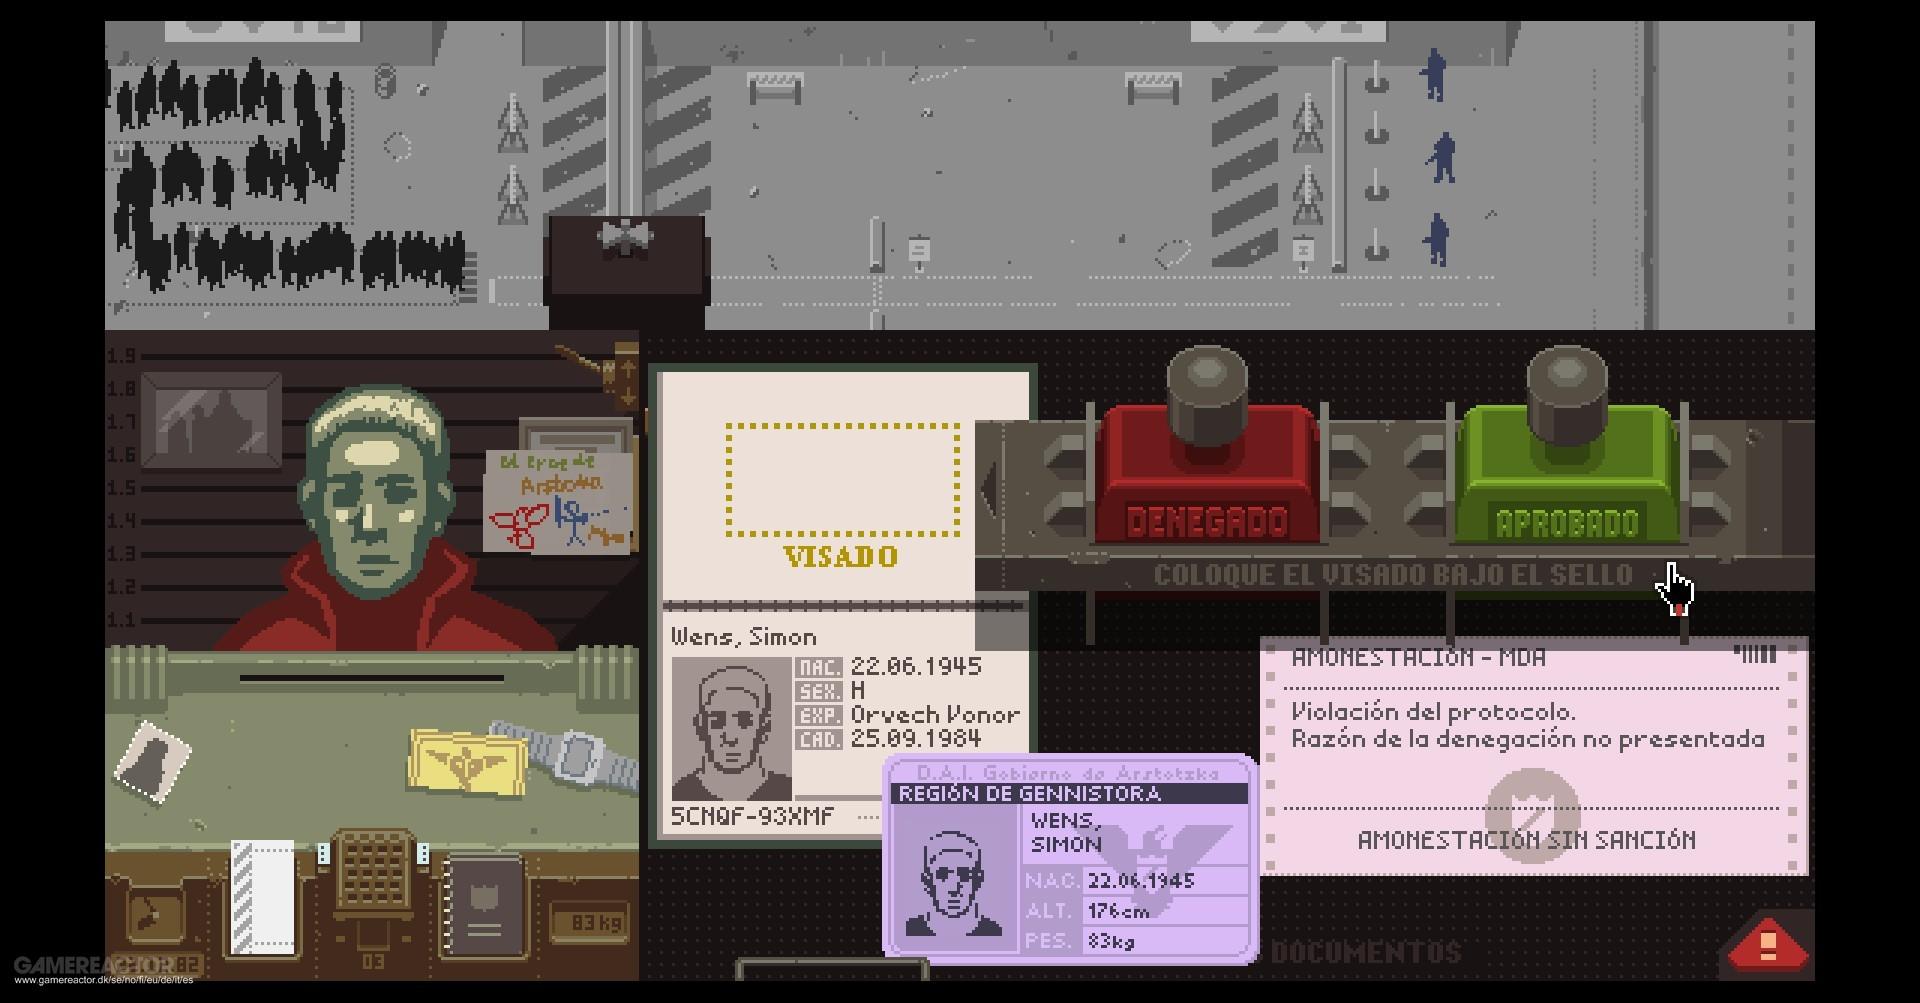 «Papers, Please» – En passkontrollørs hverdag